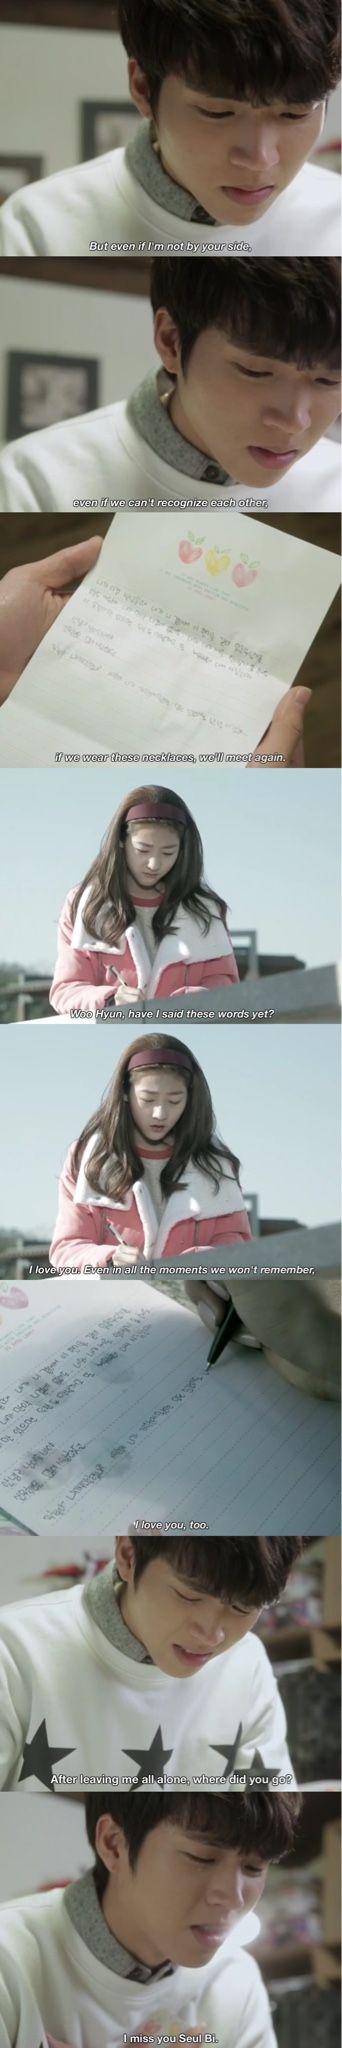 Hi School Love On Ep 20 Seul Bi s love letter to Woo hyun